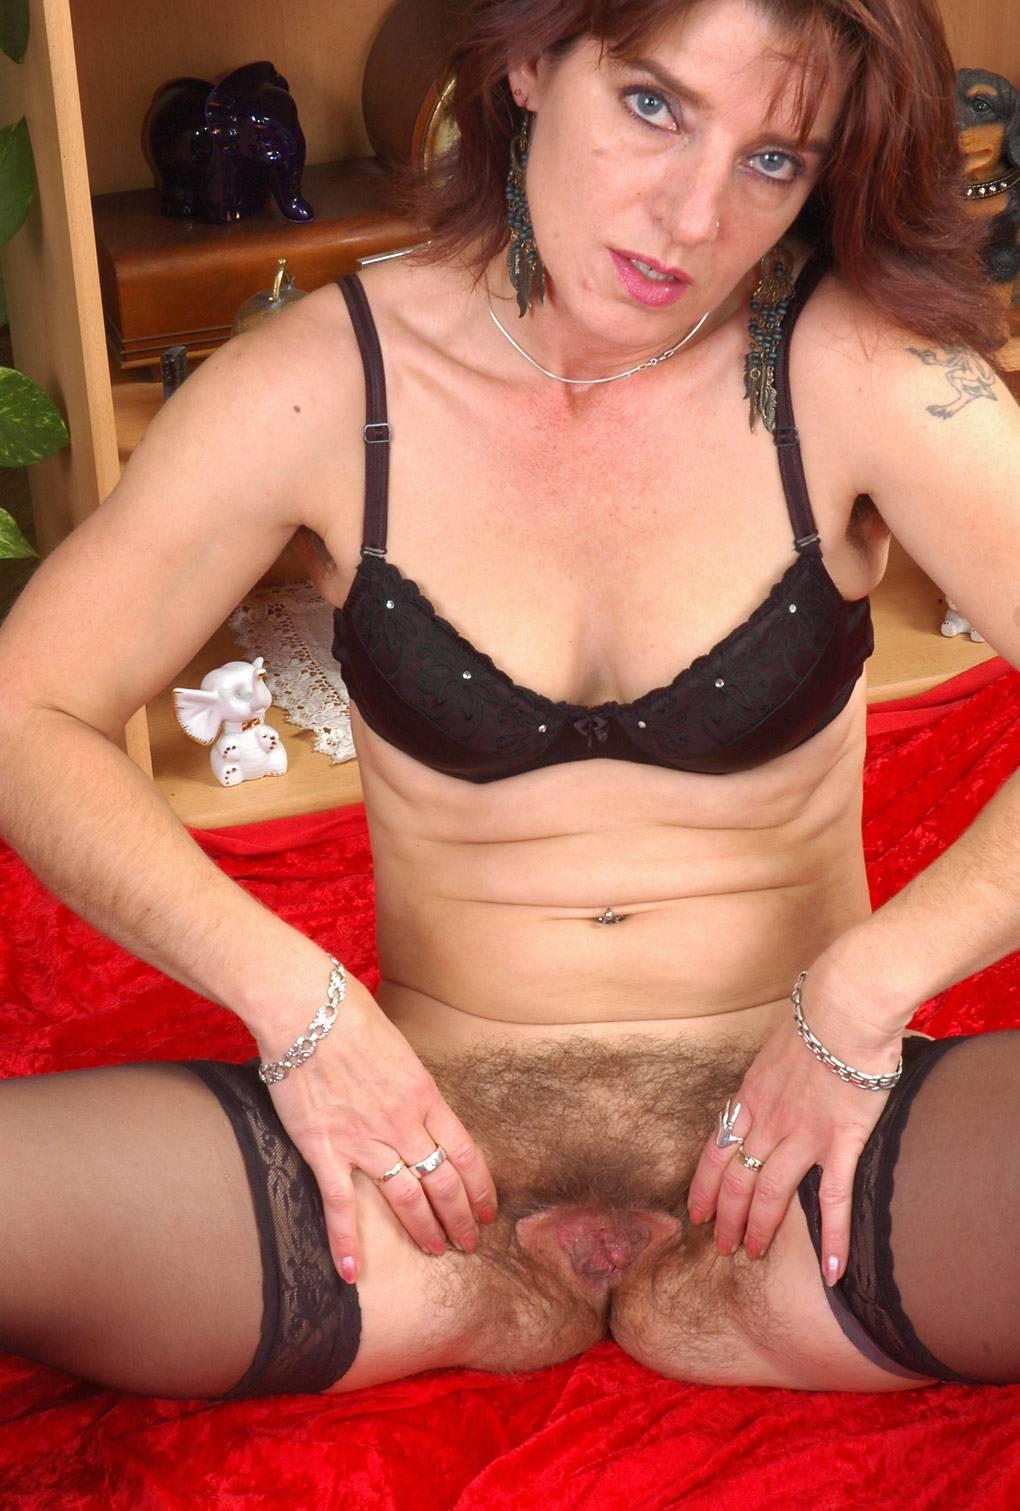 sunny leone hot sex scene